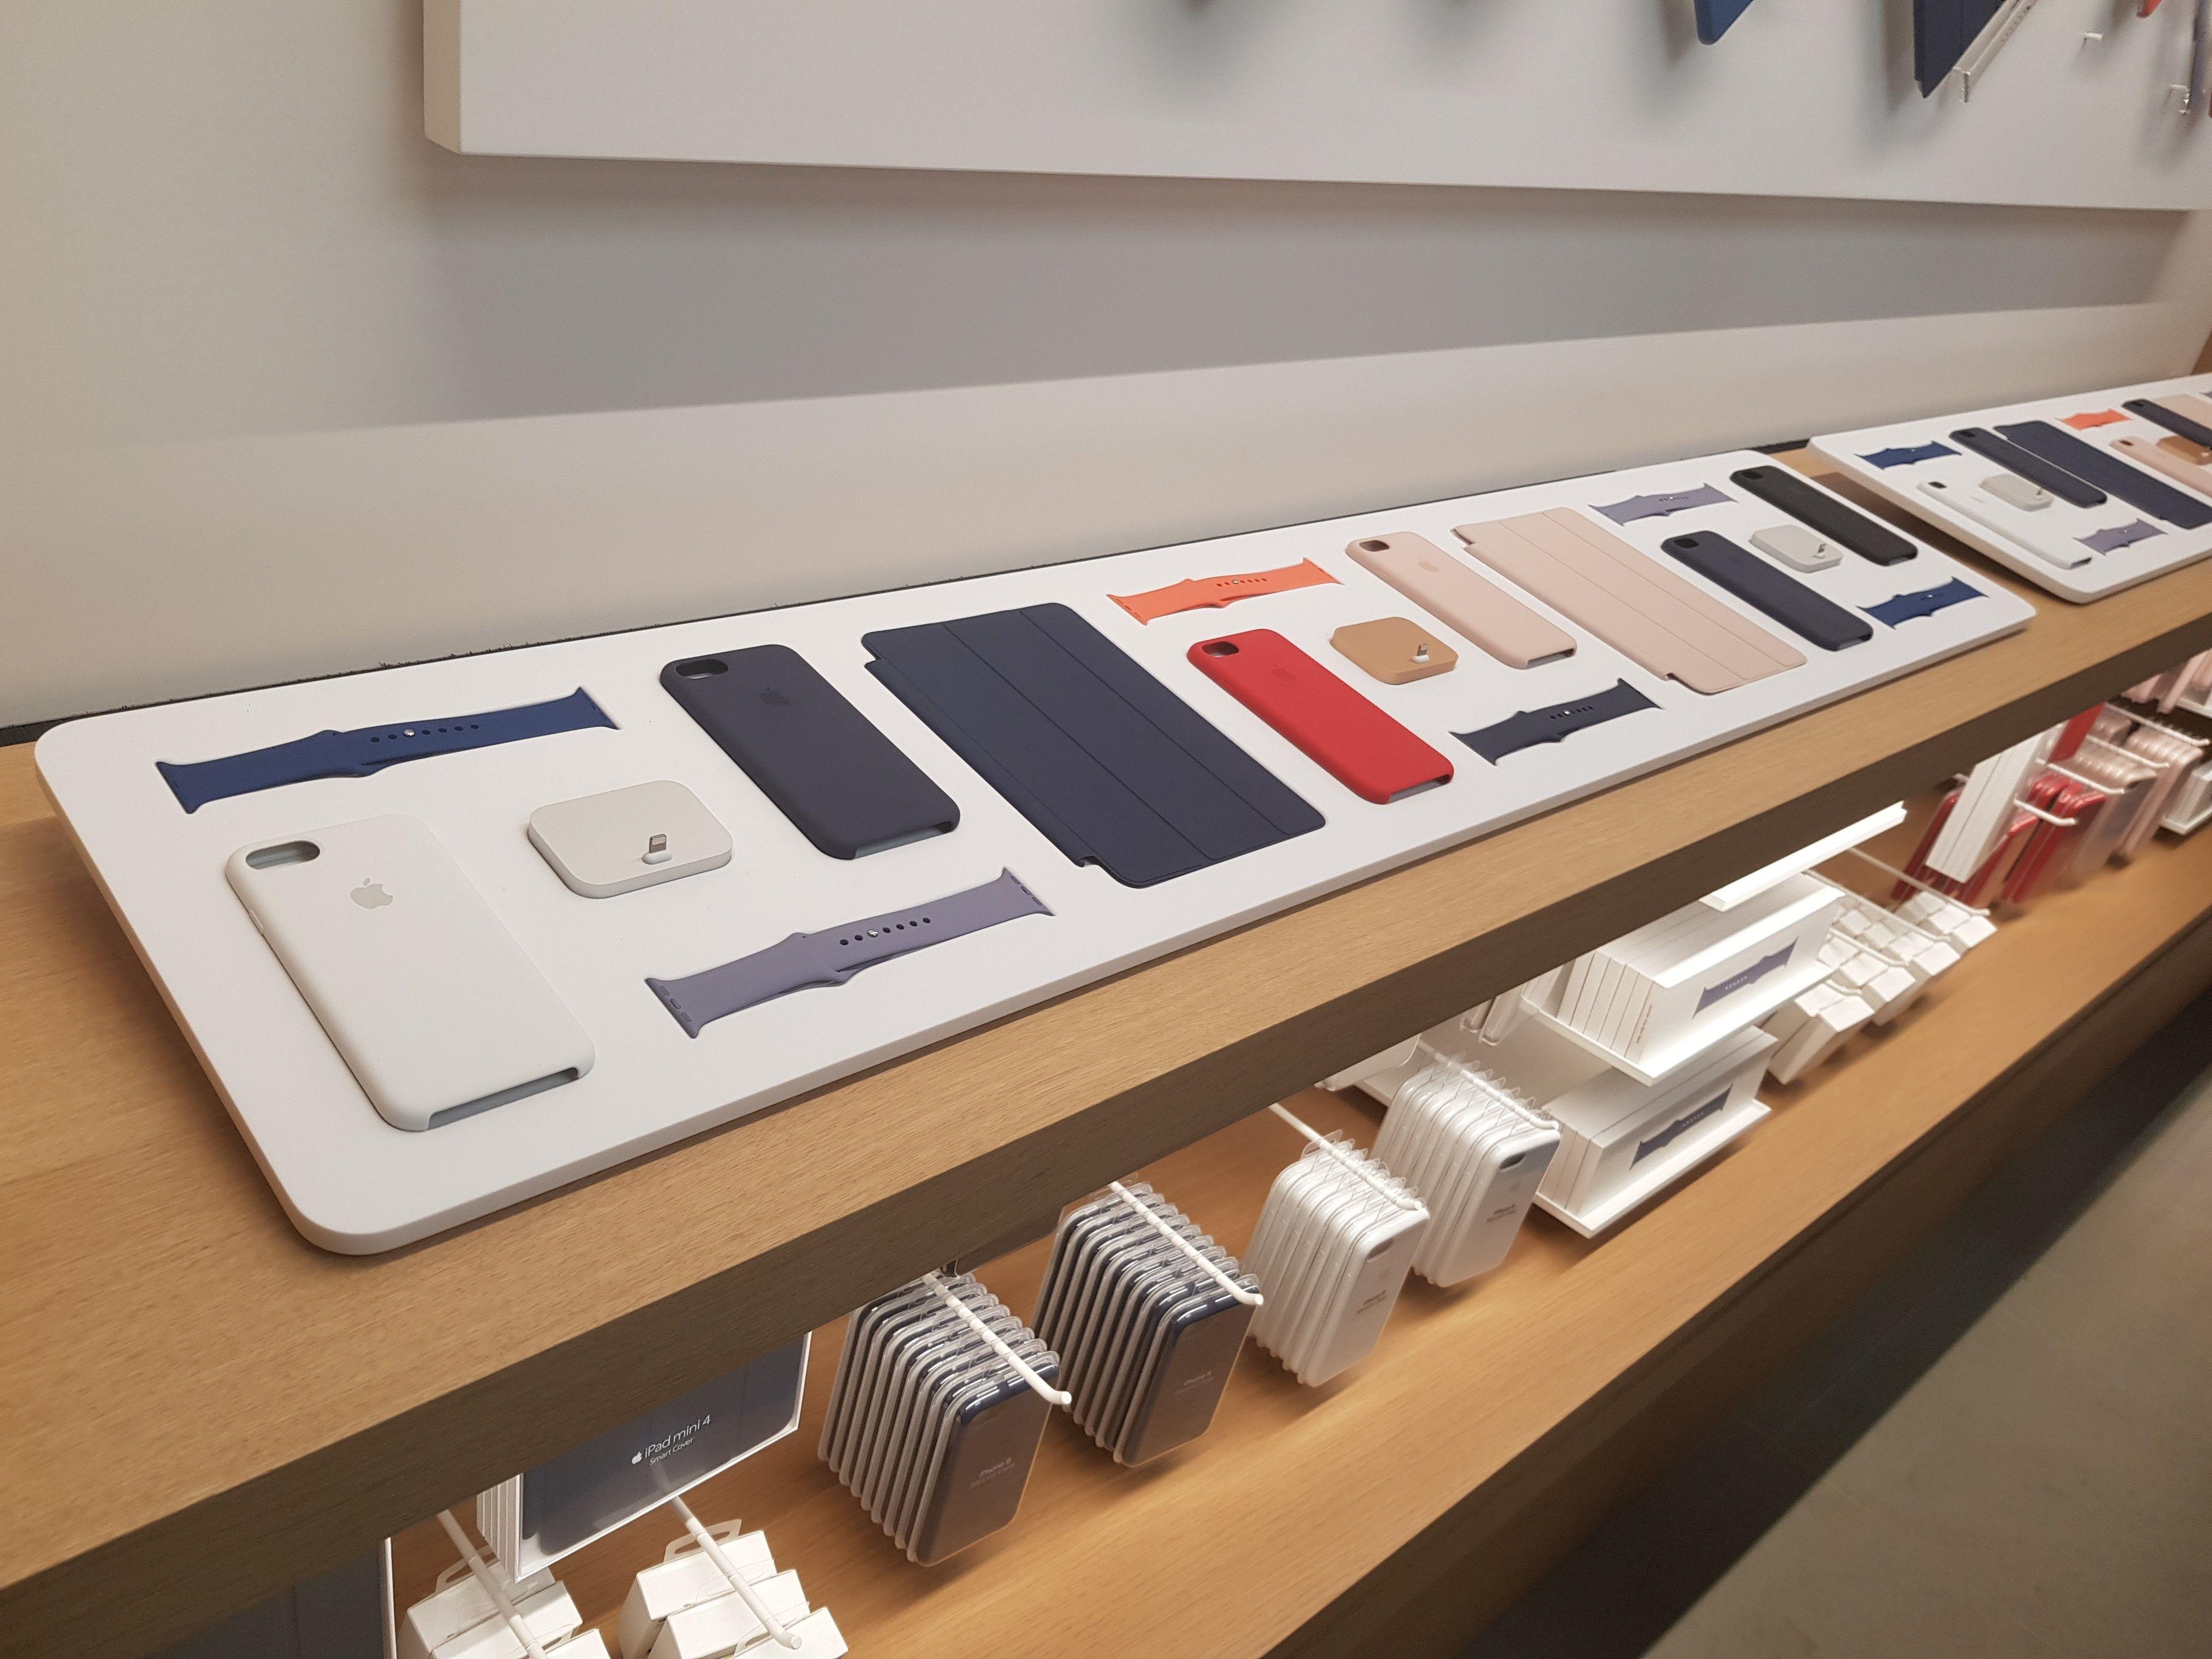 Apple Store Covent Garden Accessory Wall Apple Store Design Apple Store Interior Mobile Shop Design